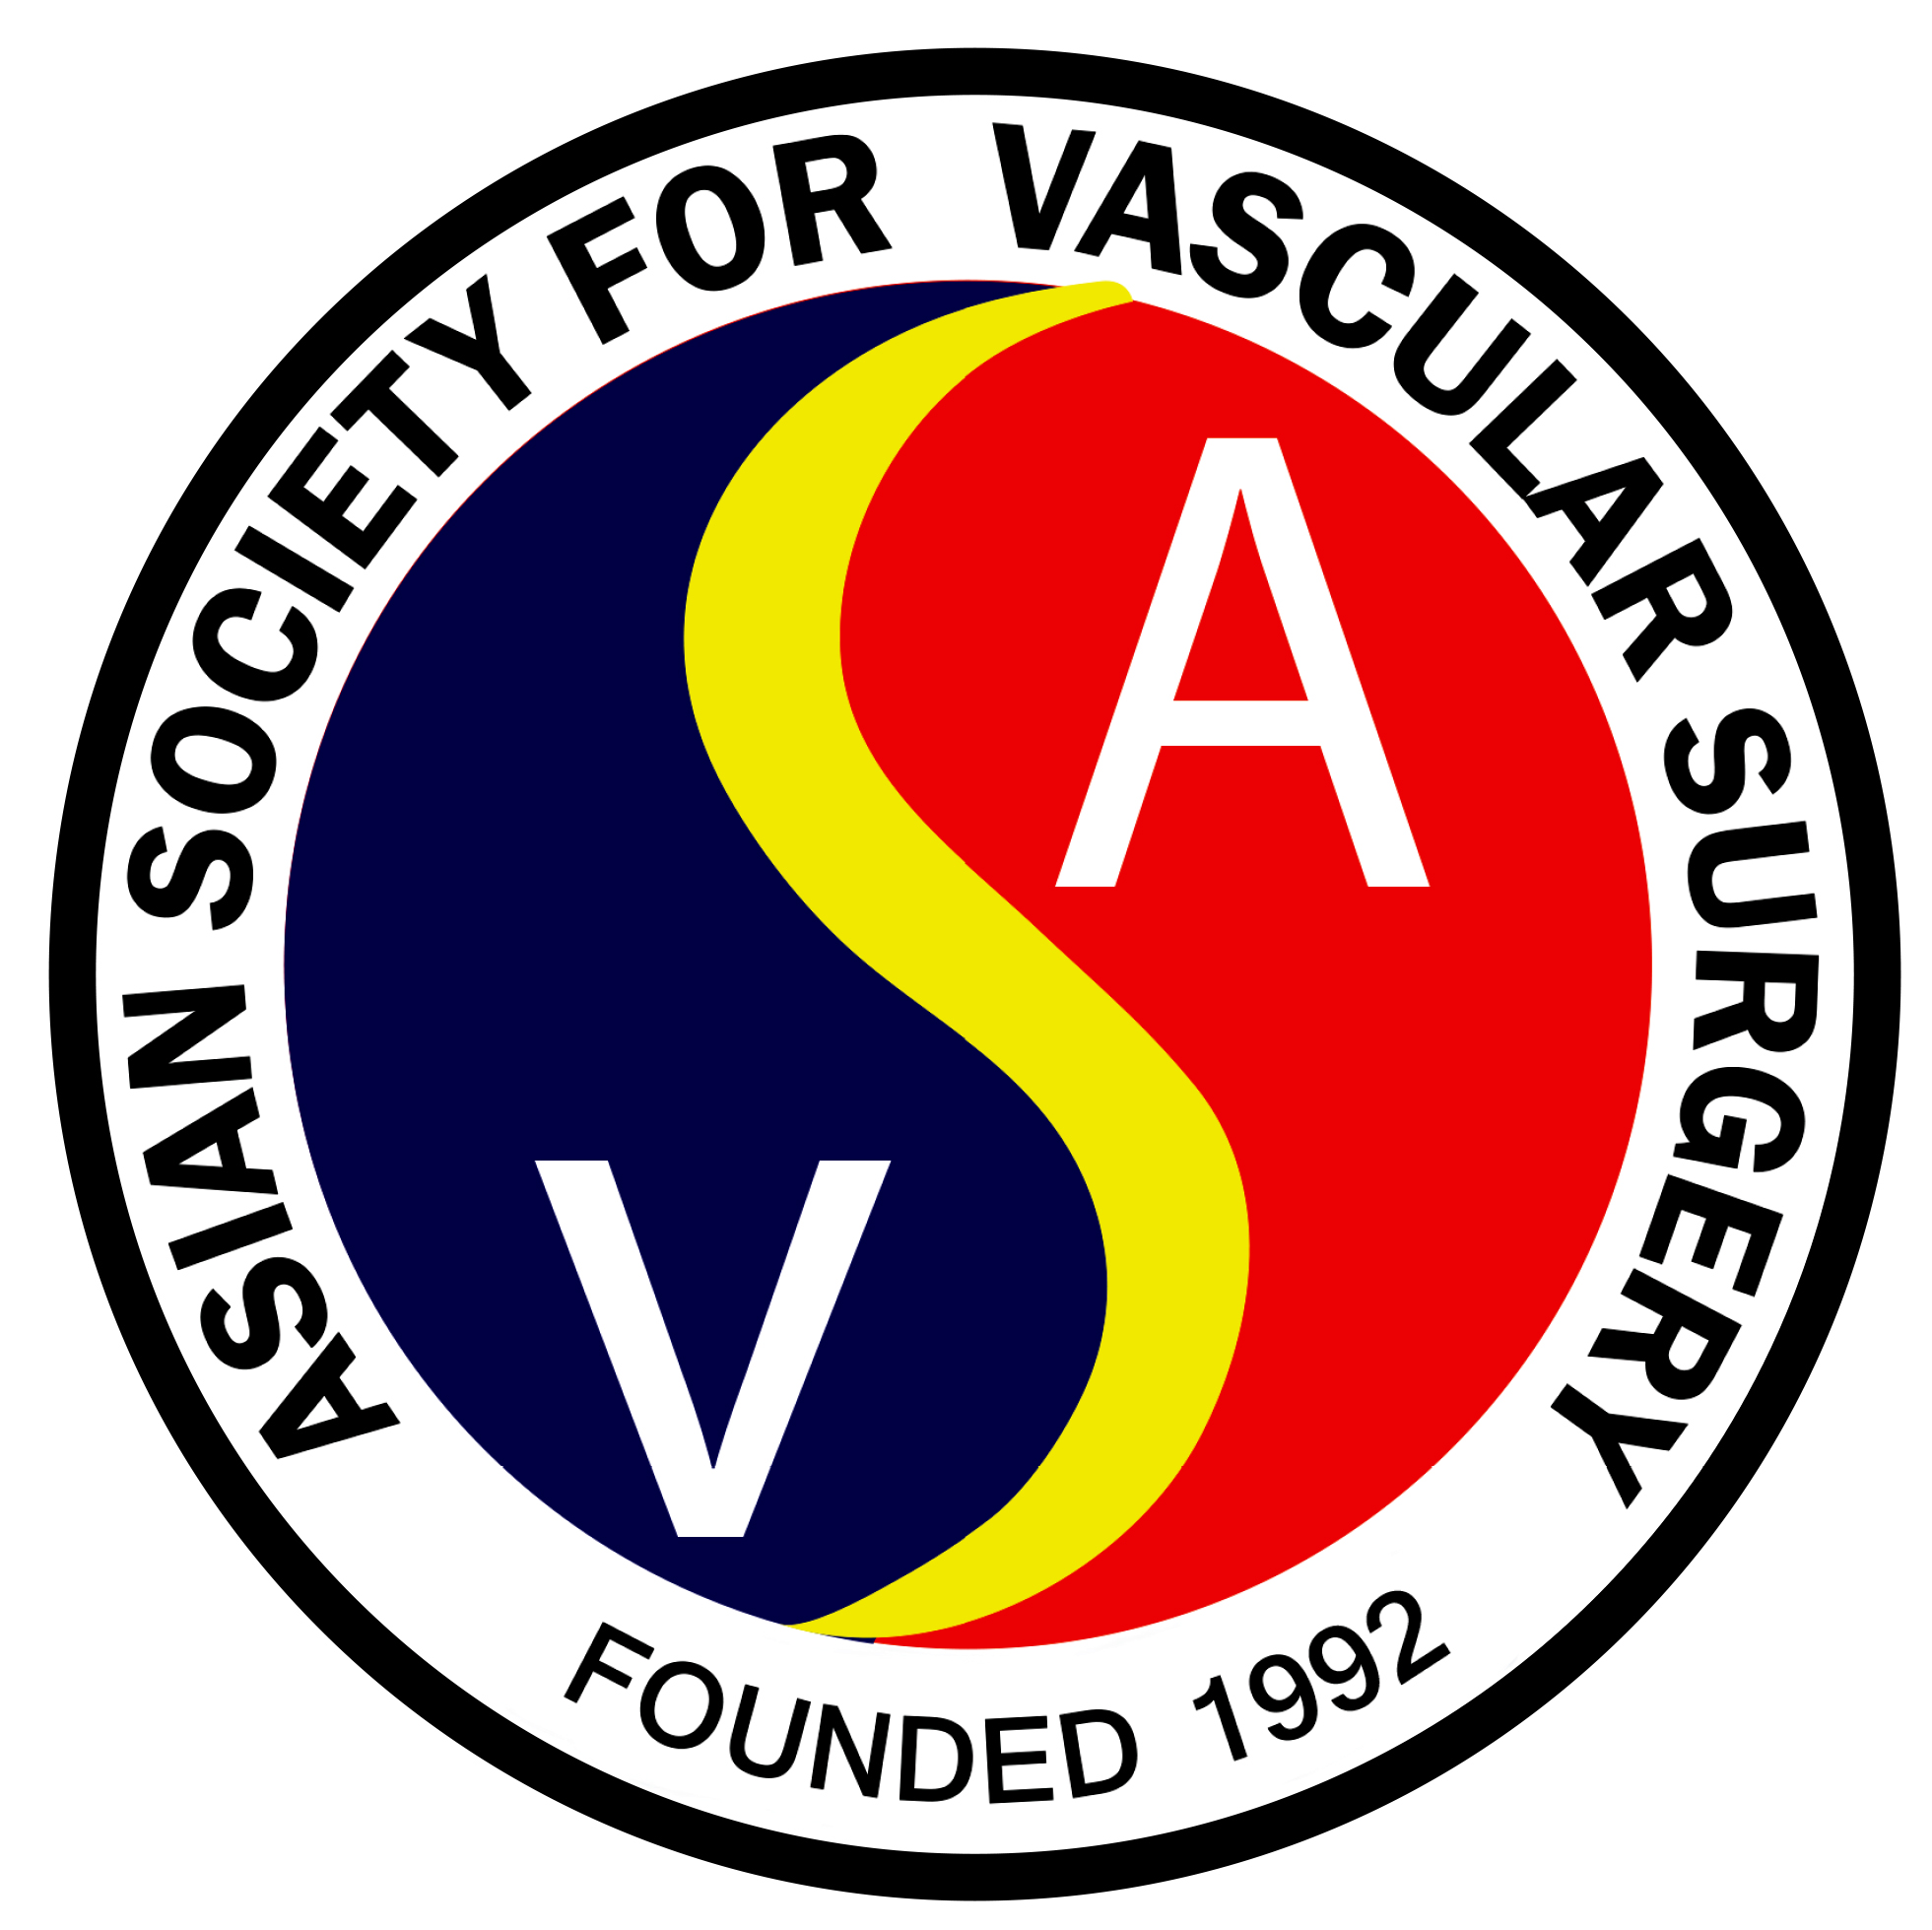 veith-podium-logo-asvs.jpg.png